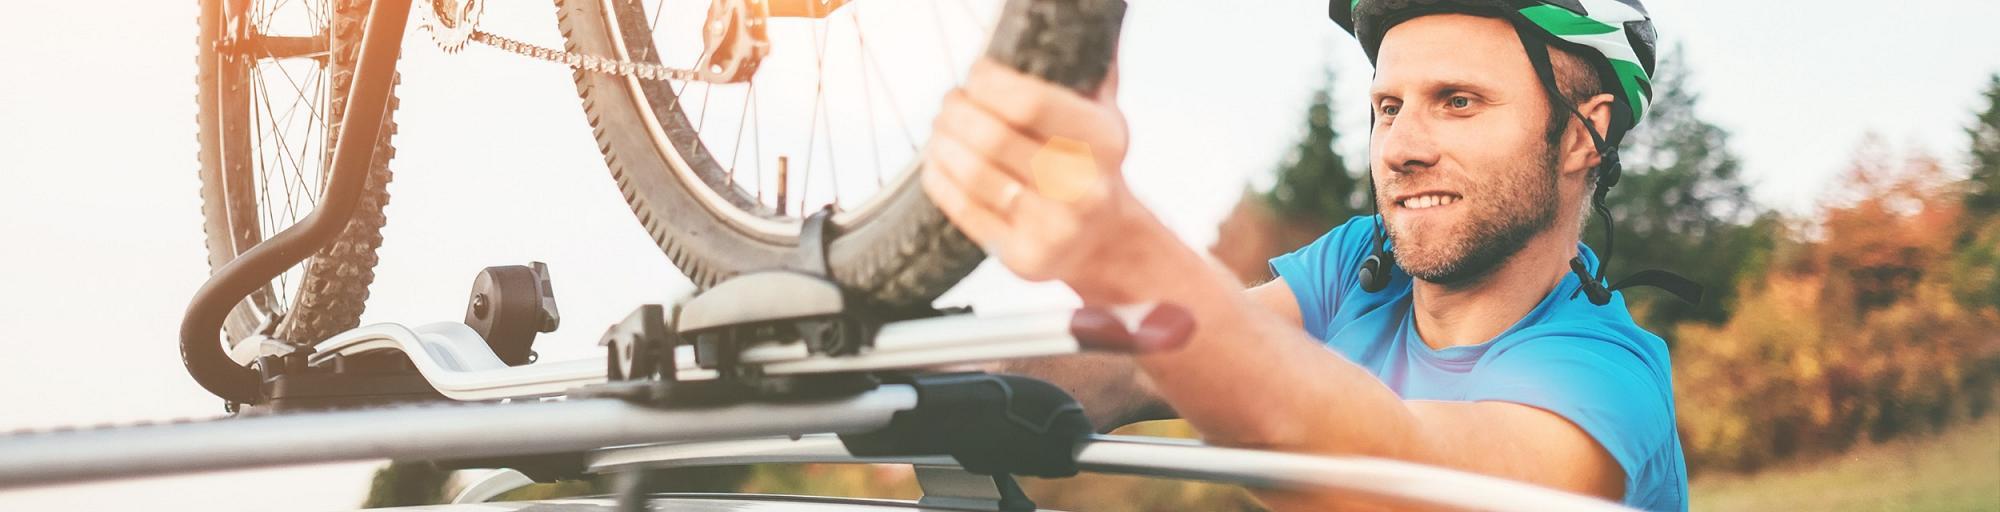 Fahrradträger leihen